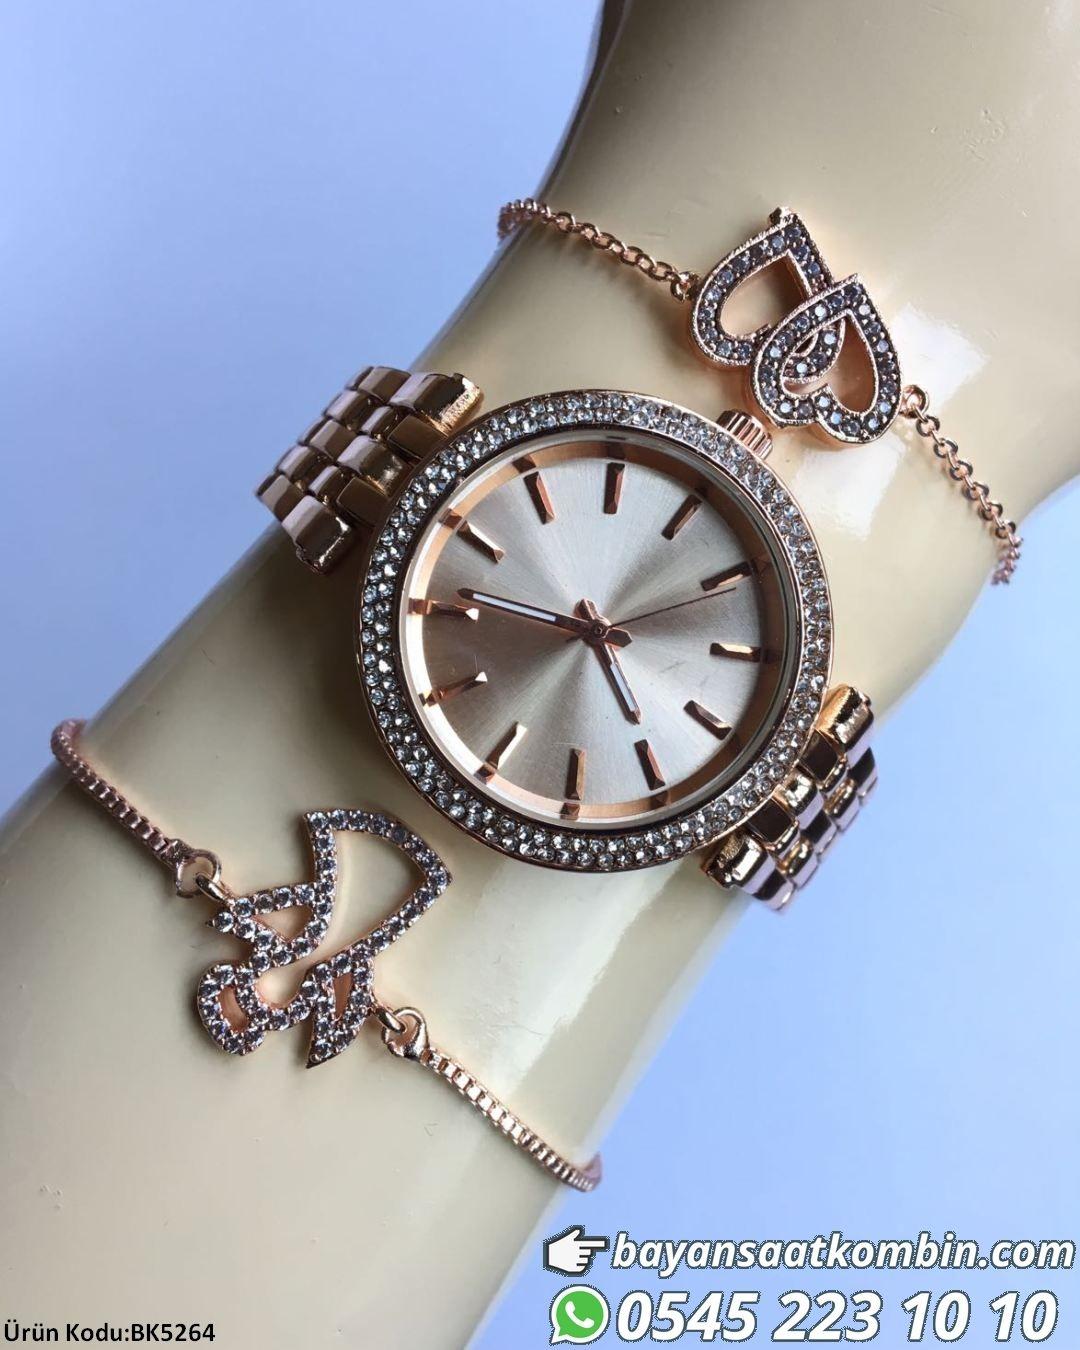 Saat Bileklik Kombini Bileklikler Saat Ile Birlikte Gonderilir Fiyat 49 99 Tl Bankakarti Kredi Kartihavale Eft Watches Women Fashion Accessories Womens Watches